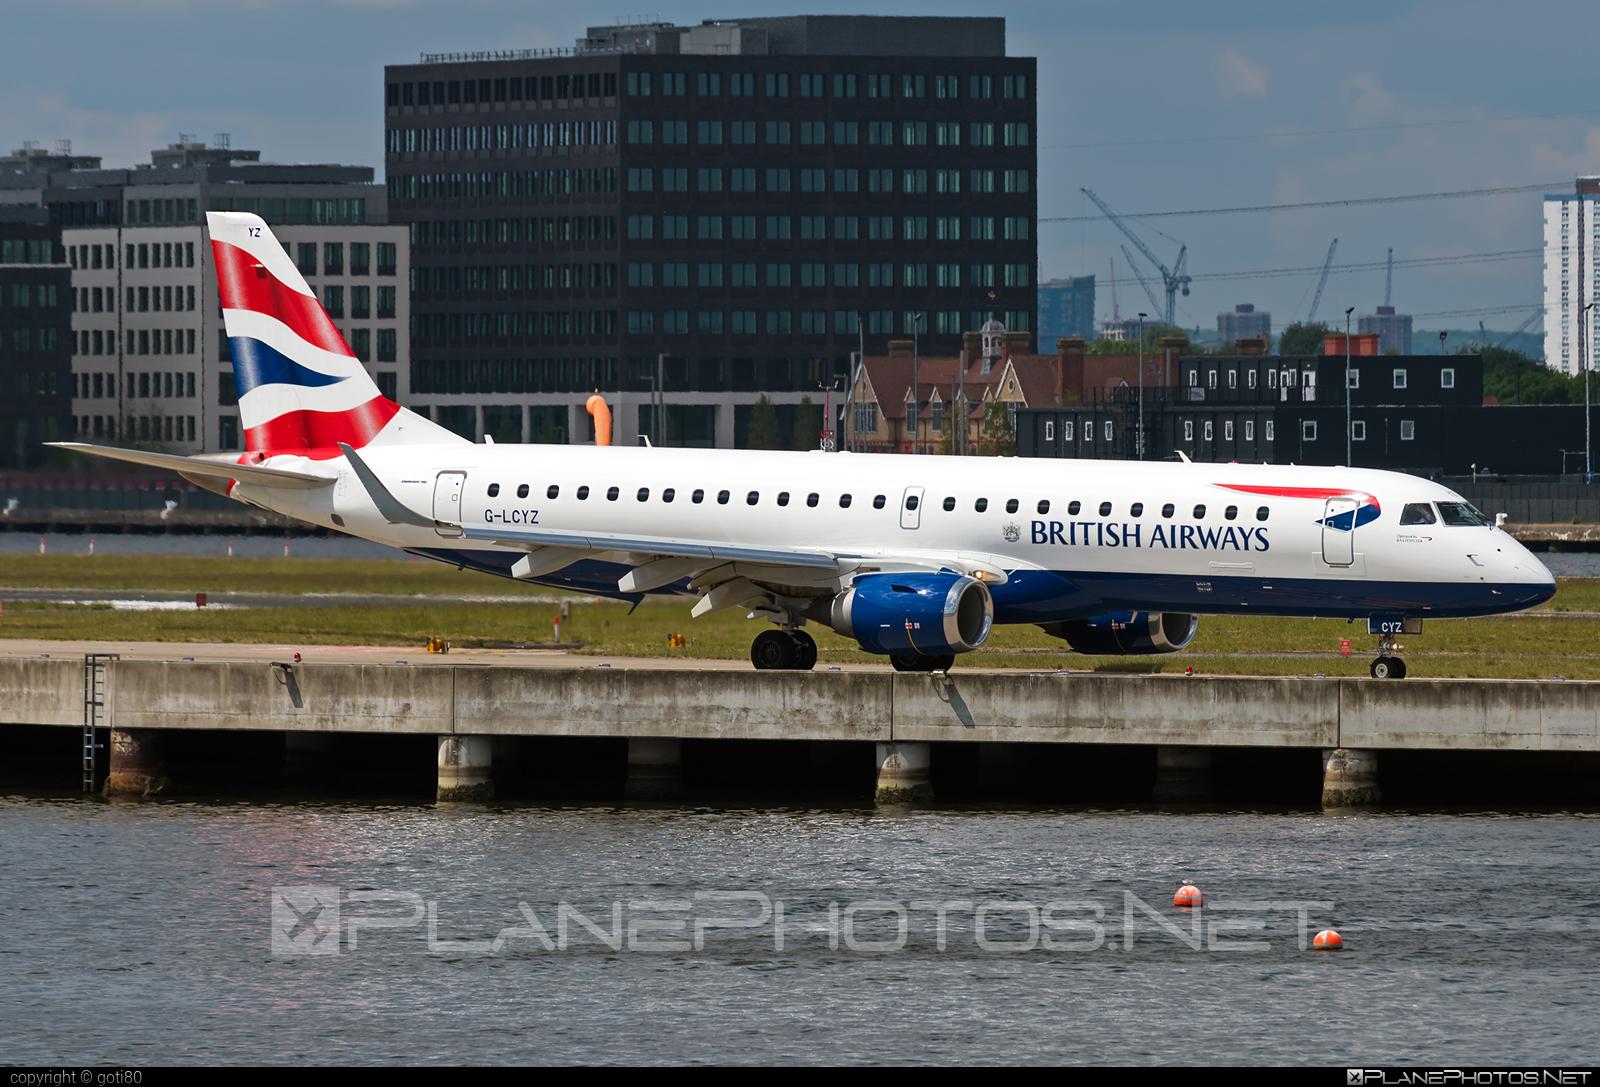 Embraer E190SR (ERJ-190-100SR) - G-LCYZ operated by BA CityFlyer #e190 #e190100 #e190100sr #e190sr #embraer #embraer190 #embraer190100sr #embraer190sr